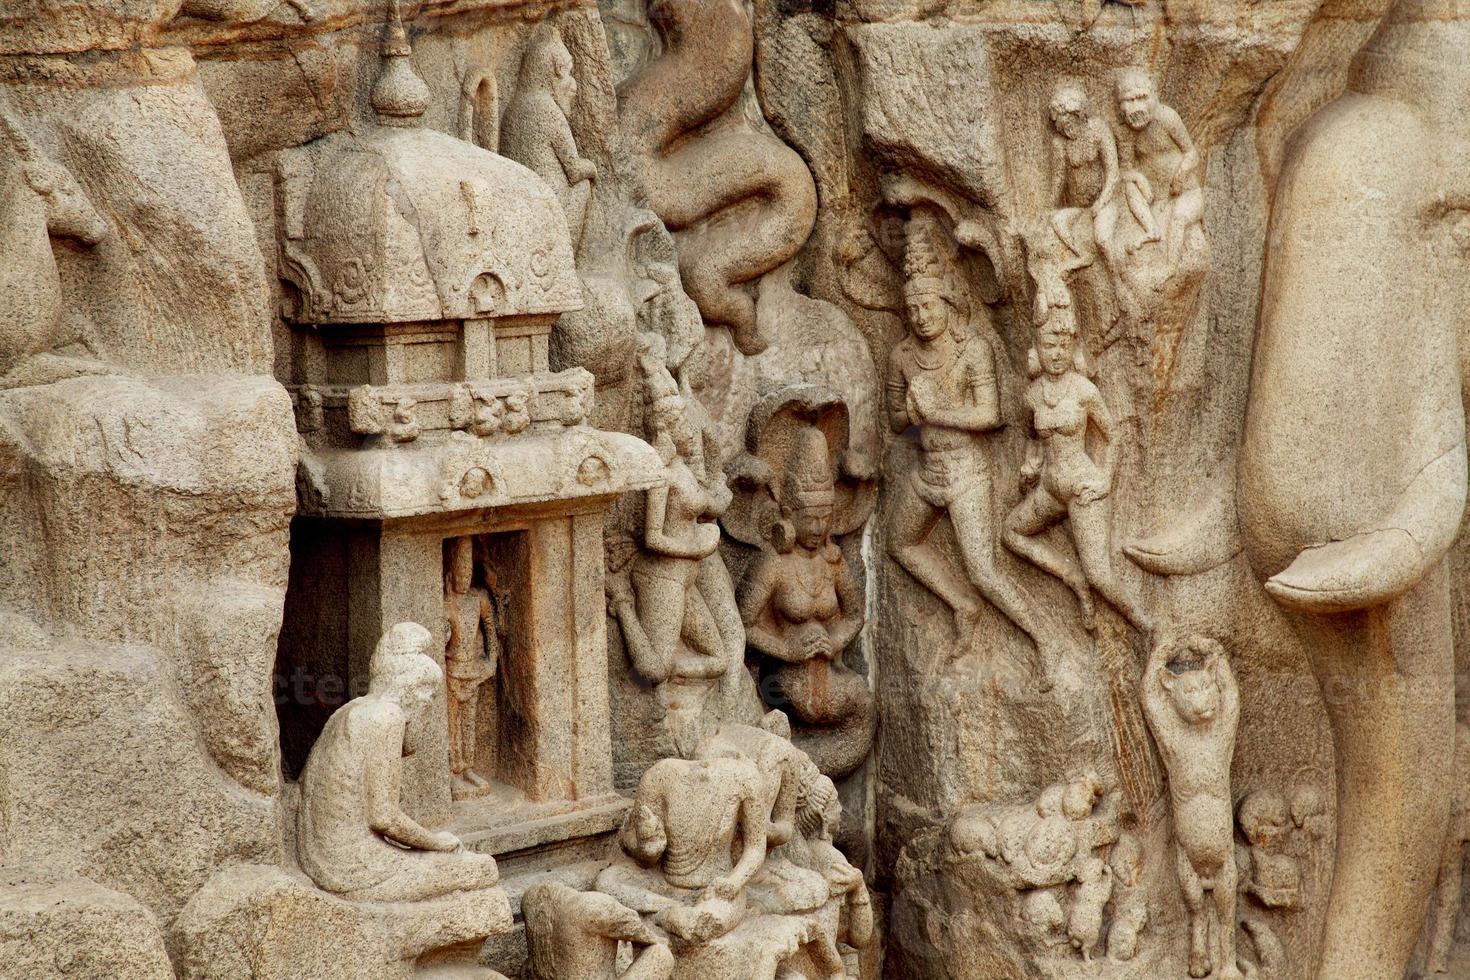 La penitenza di Arjuna - Discesa del Gange, Mahabalipuram, India foto